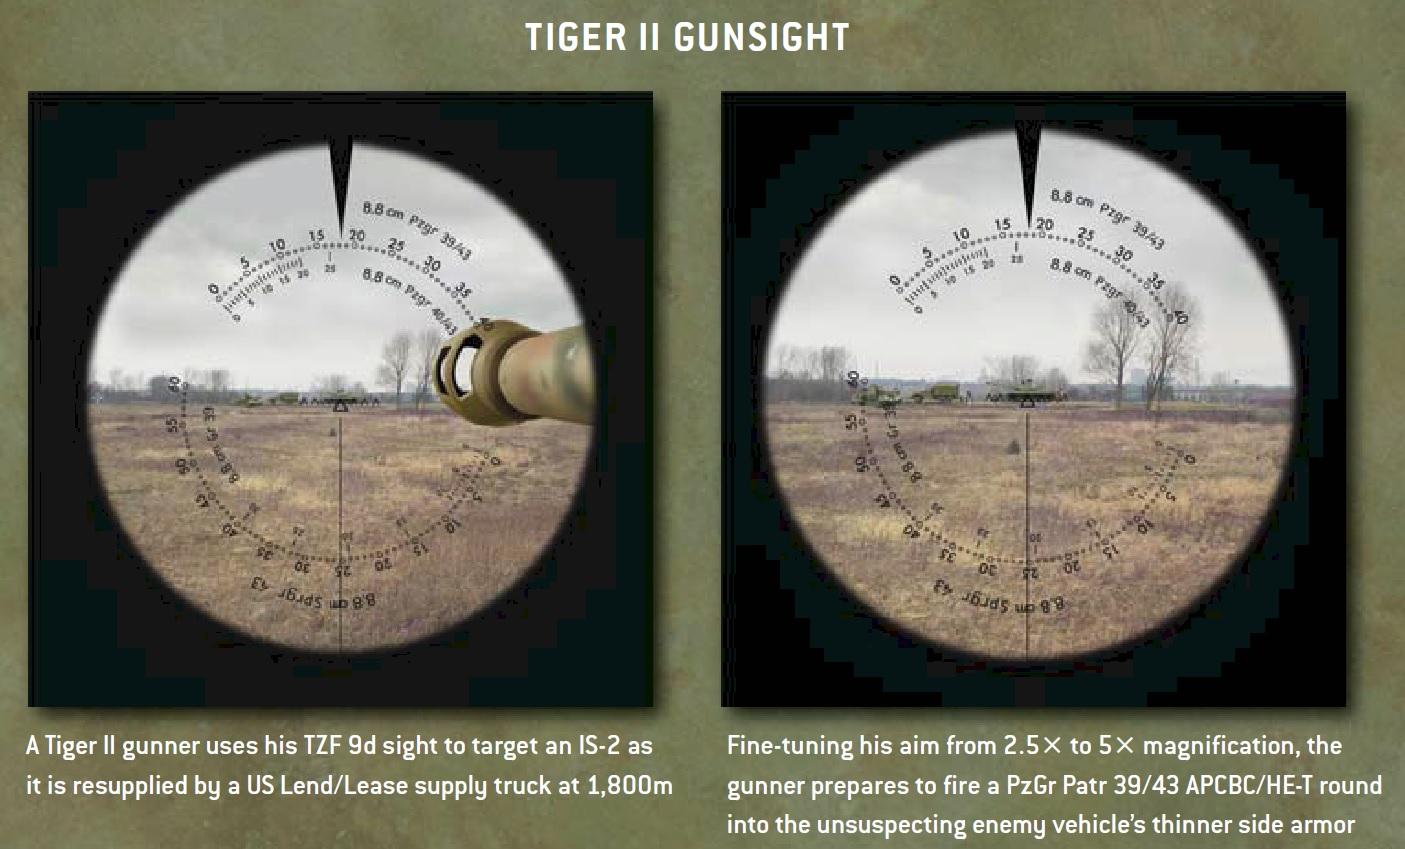 tiger-2-gunsight7fk00.jpg